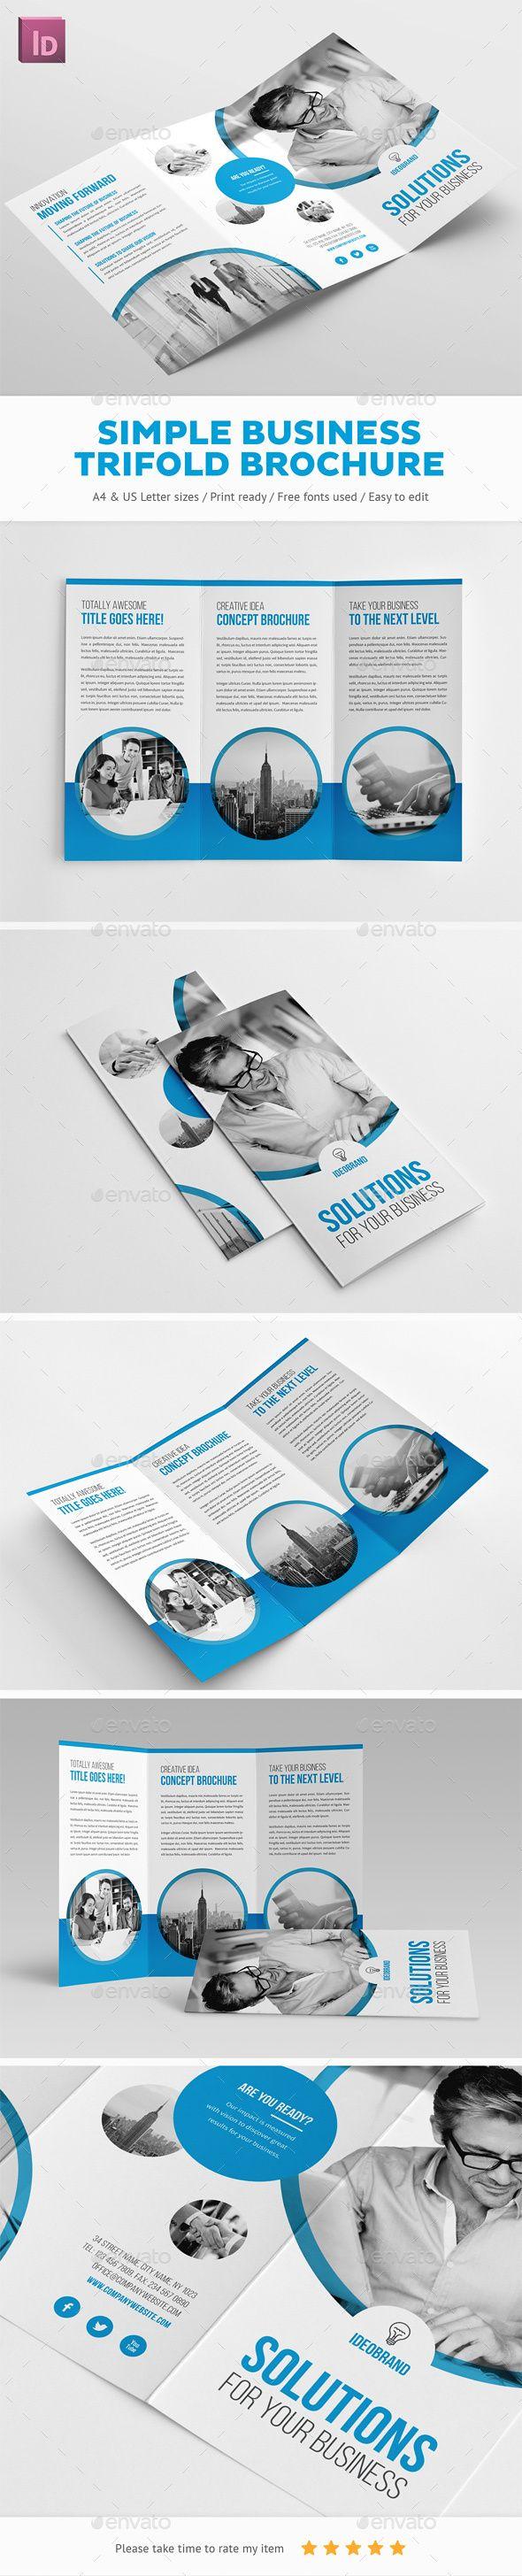 Simple Business Trifold Brochure  Brochure Template Brochures